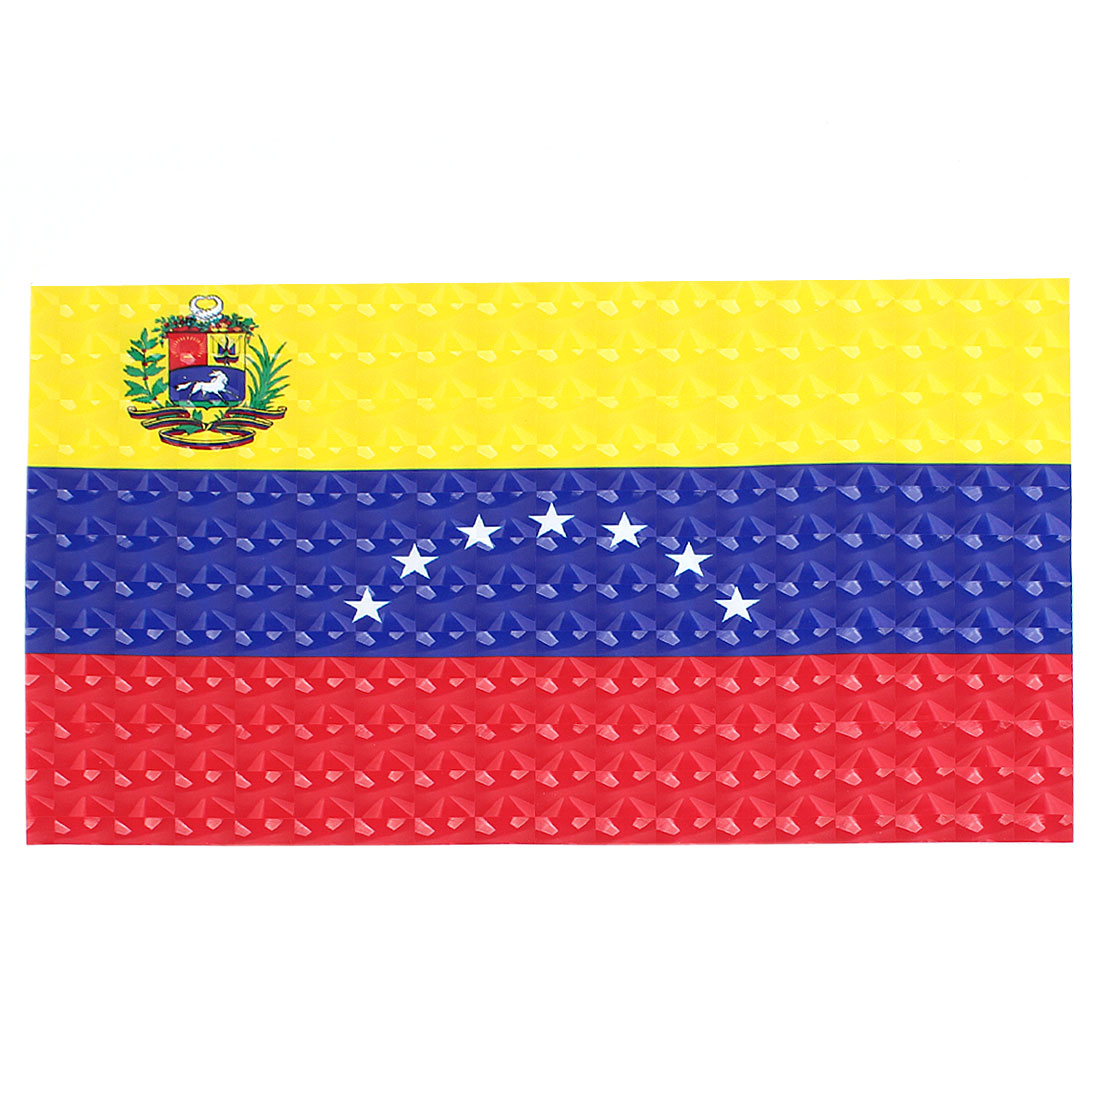 Unique Bargains Venezuelan Flag Print Vinyl 15.6  Laptop Notebook Skin Cover Decal Sticker